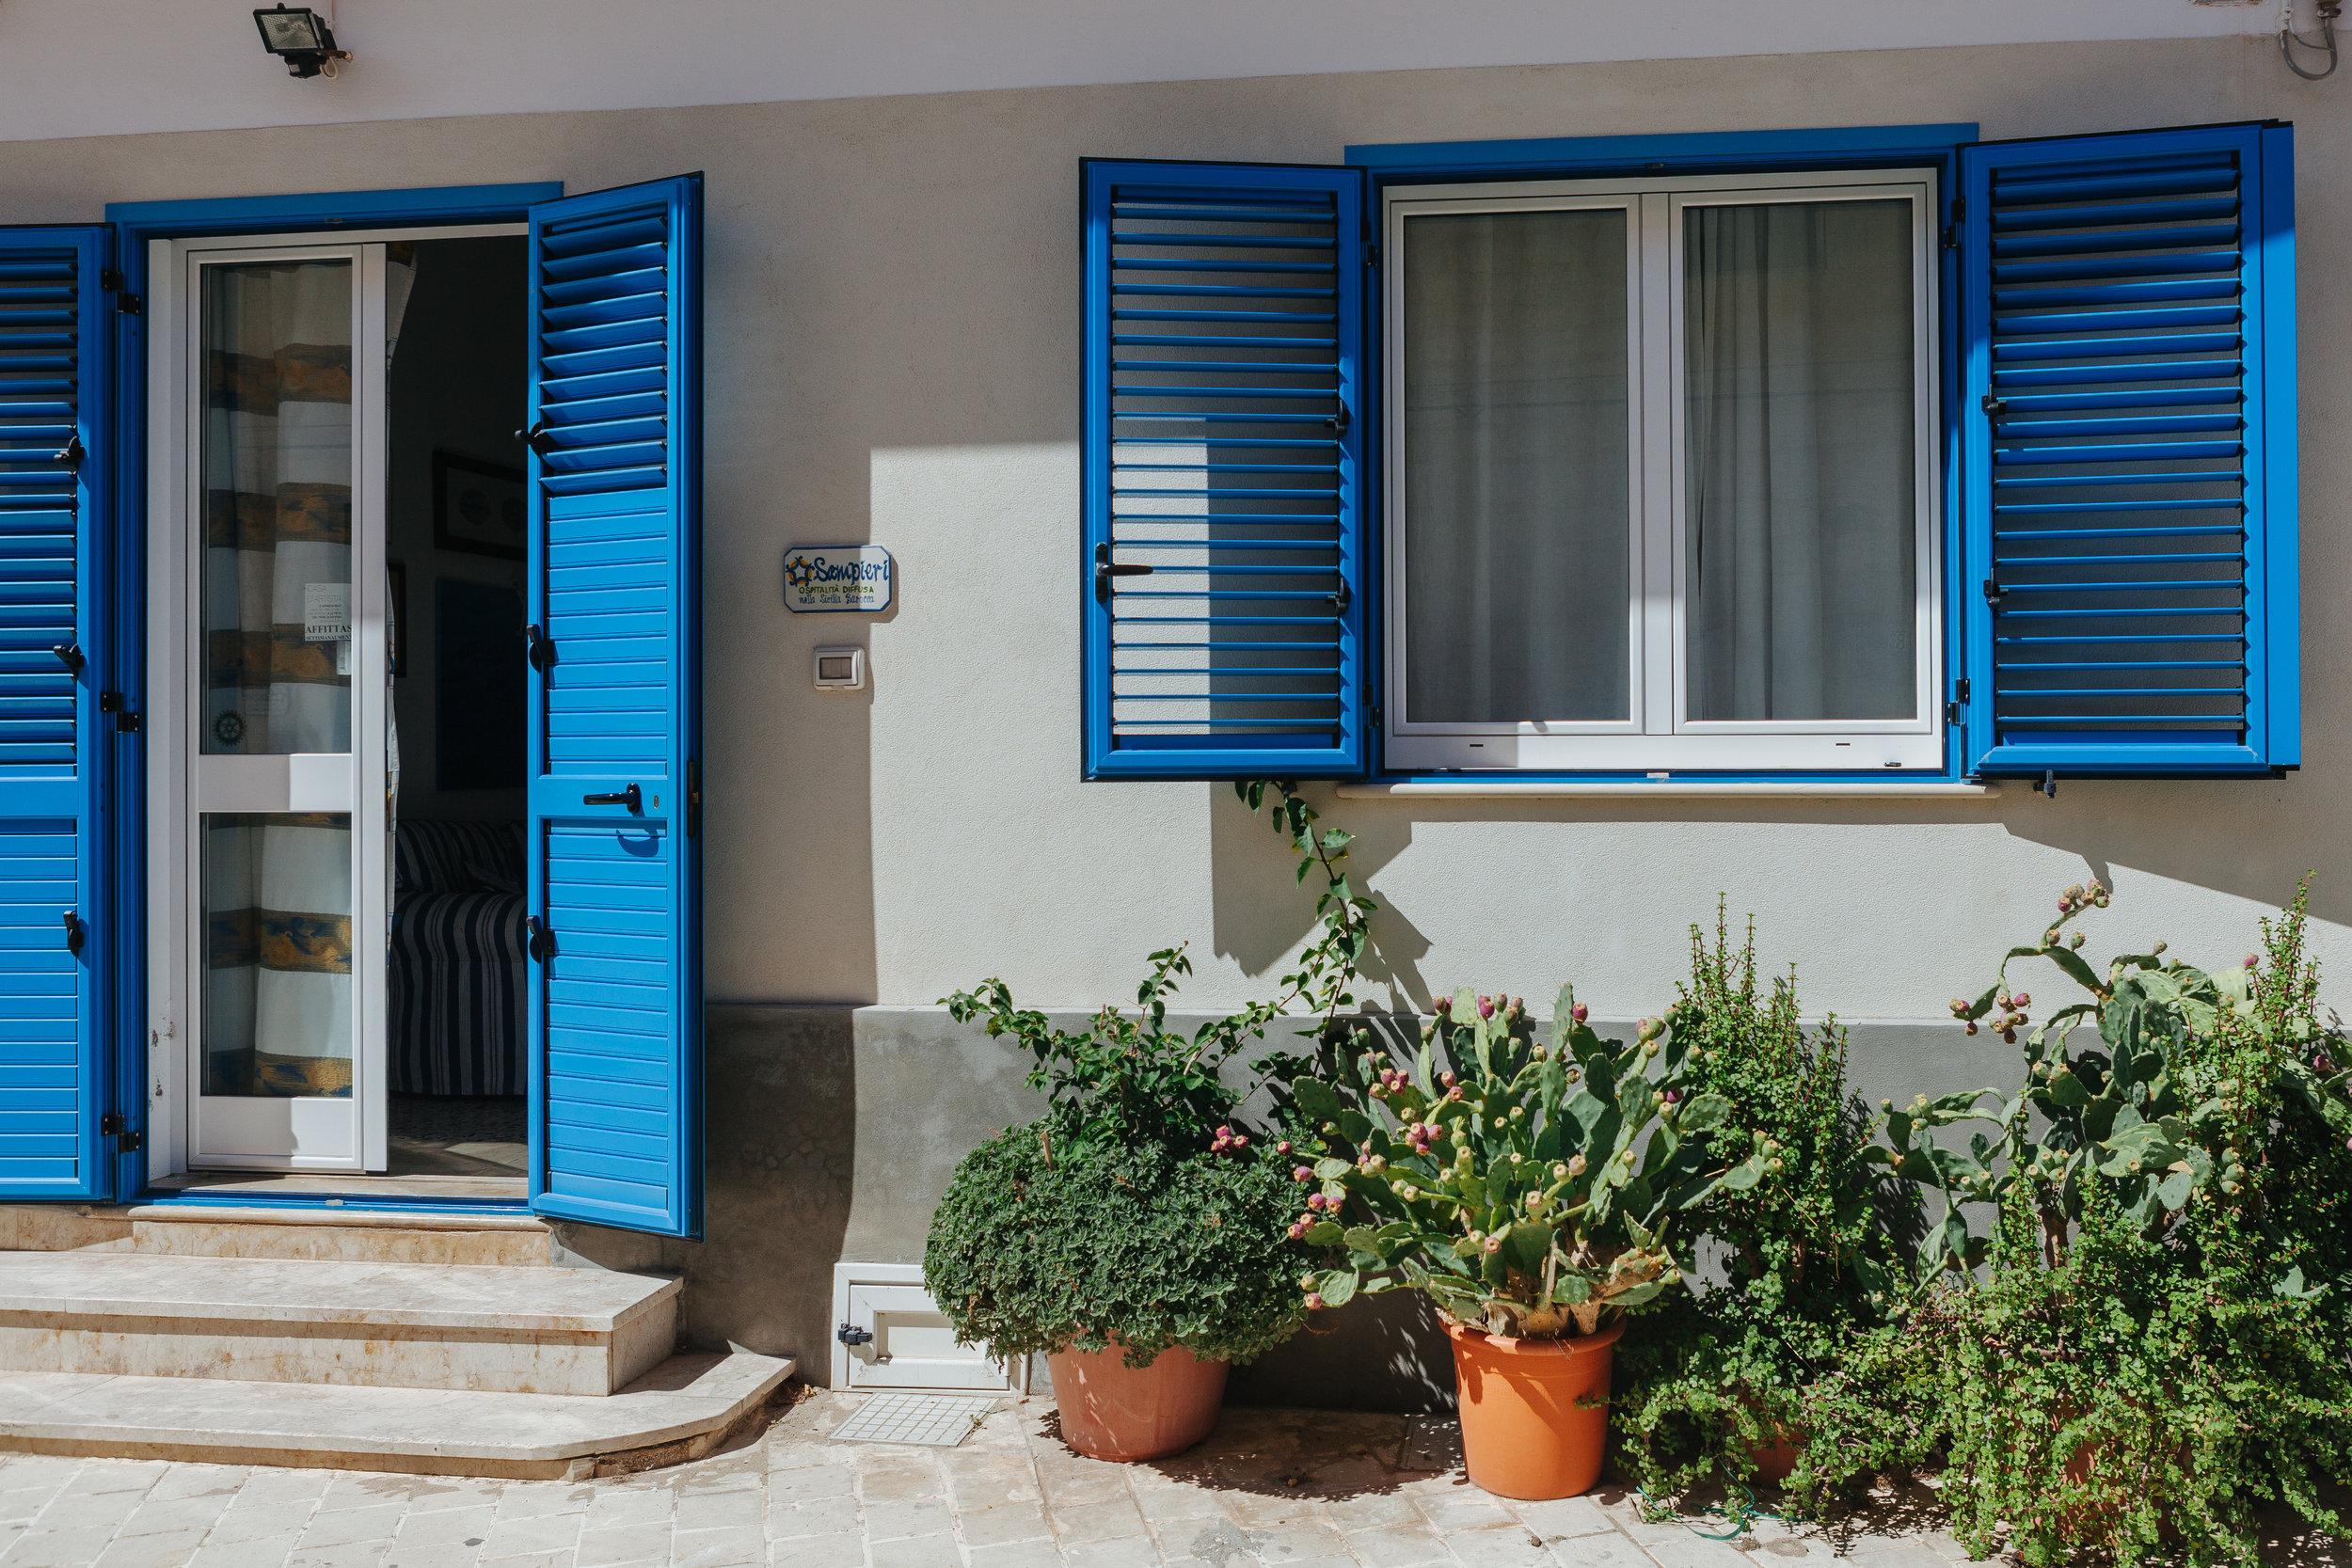 2sampieri-casa-vacanze-sicilia-appartamento-sicily-holiday-apartment-casazzurra-italia-italy.jpg